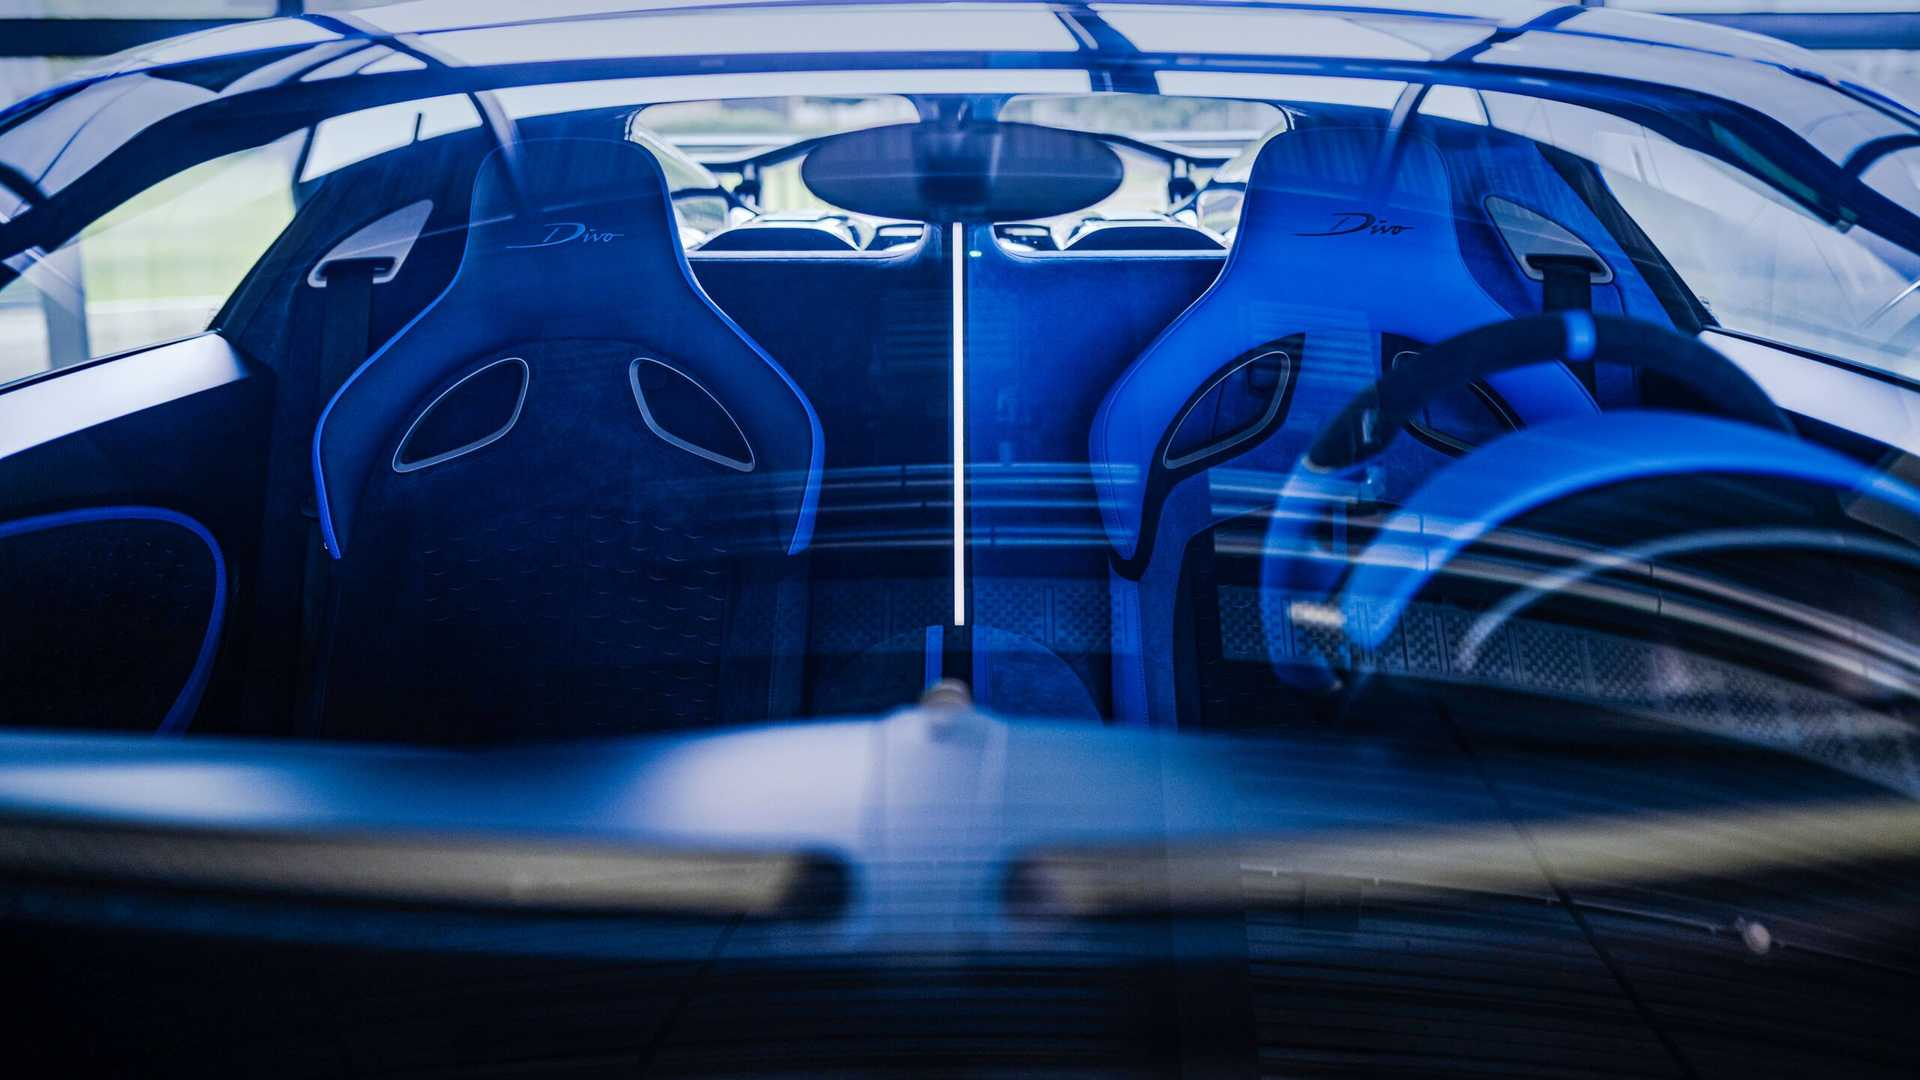 https://cdn.motor1.com/images/mgl/yrP3l/s6/bugatti-divo-interior-view.jpg